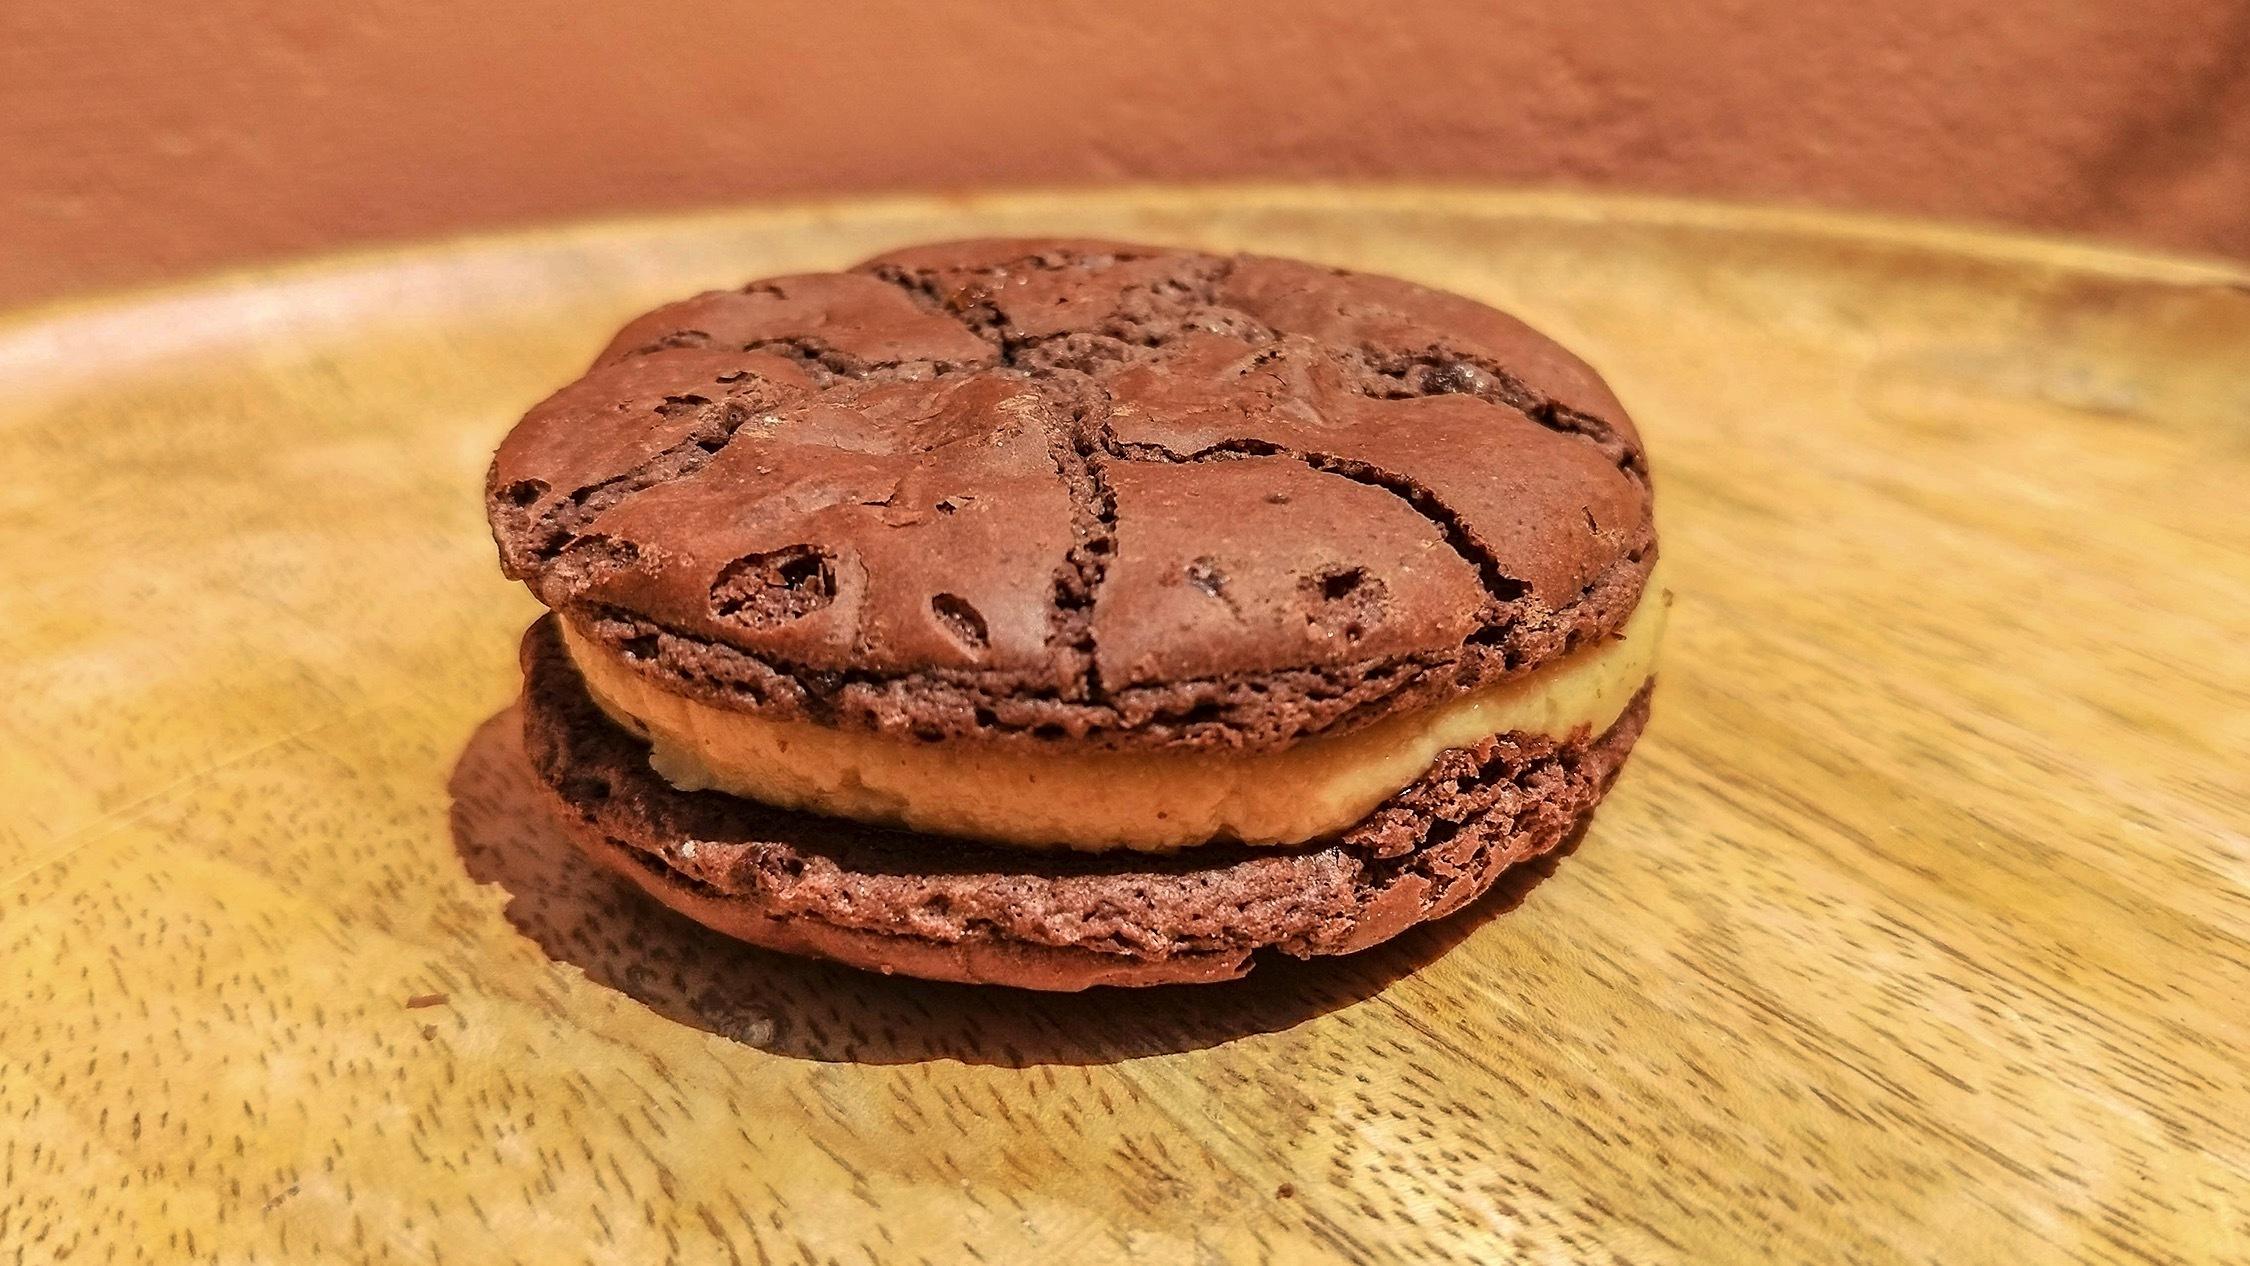 Cookie at Butterbing at Reuben Hills